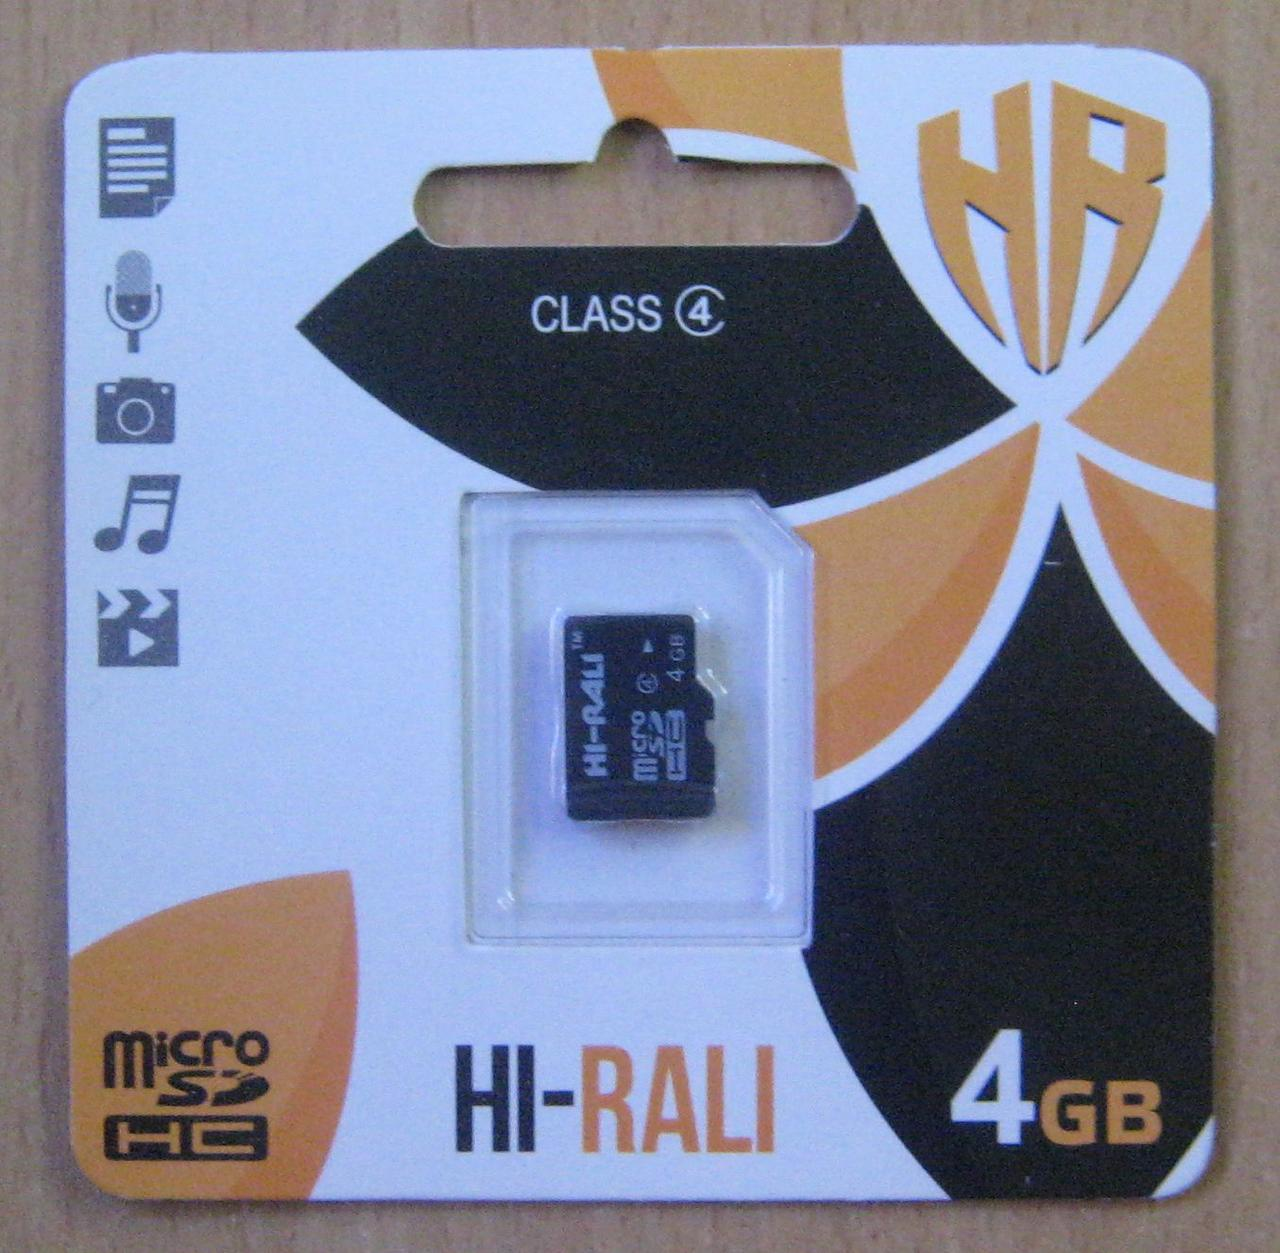 Карта памяти microSD Hi-Rali 4GB 4 class